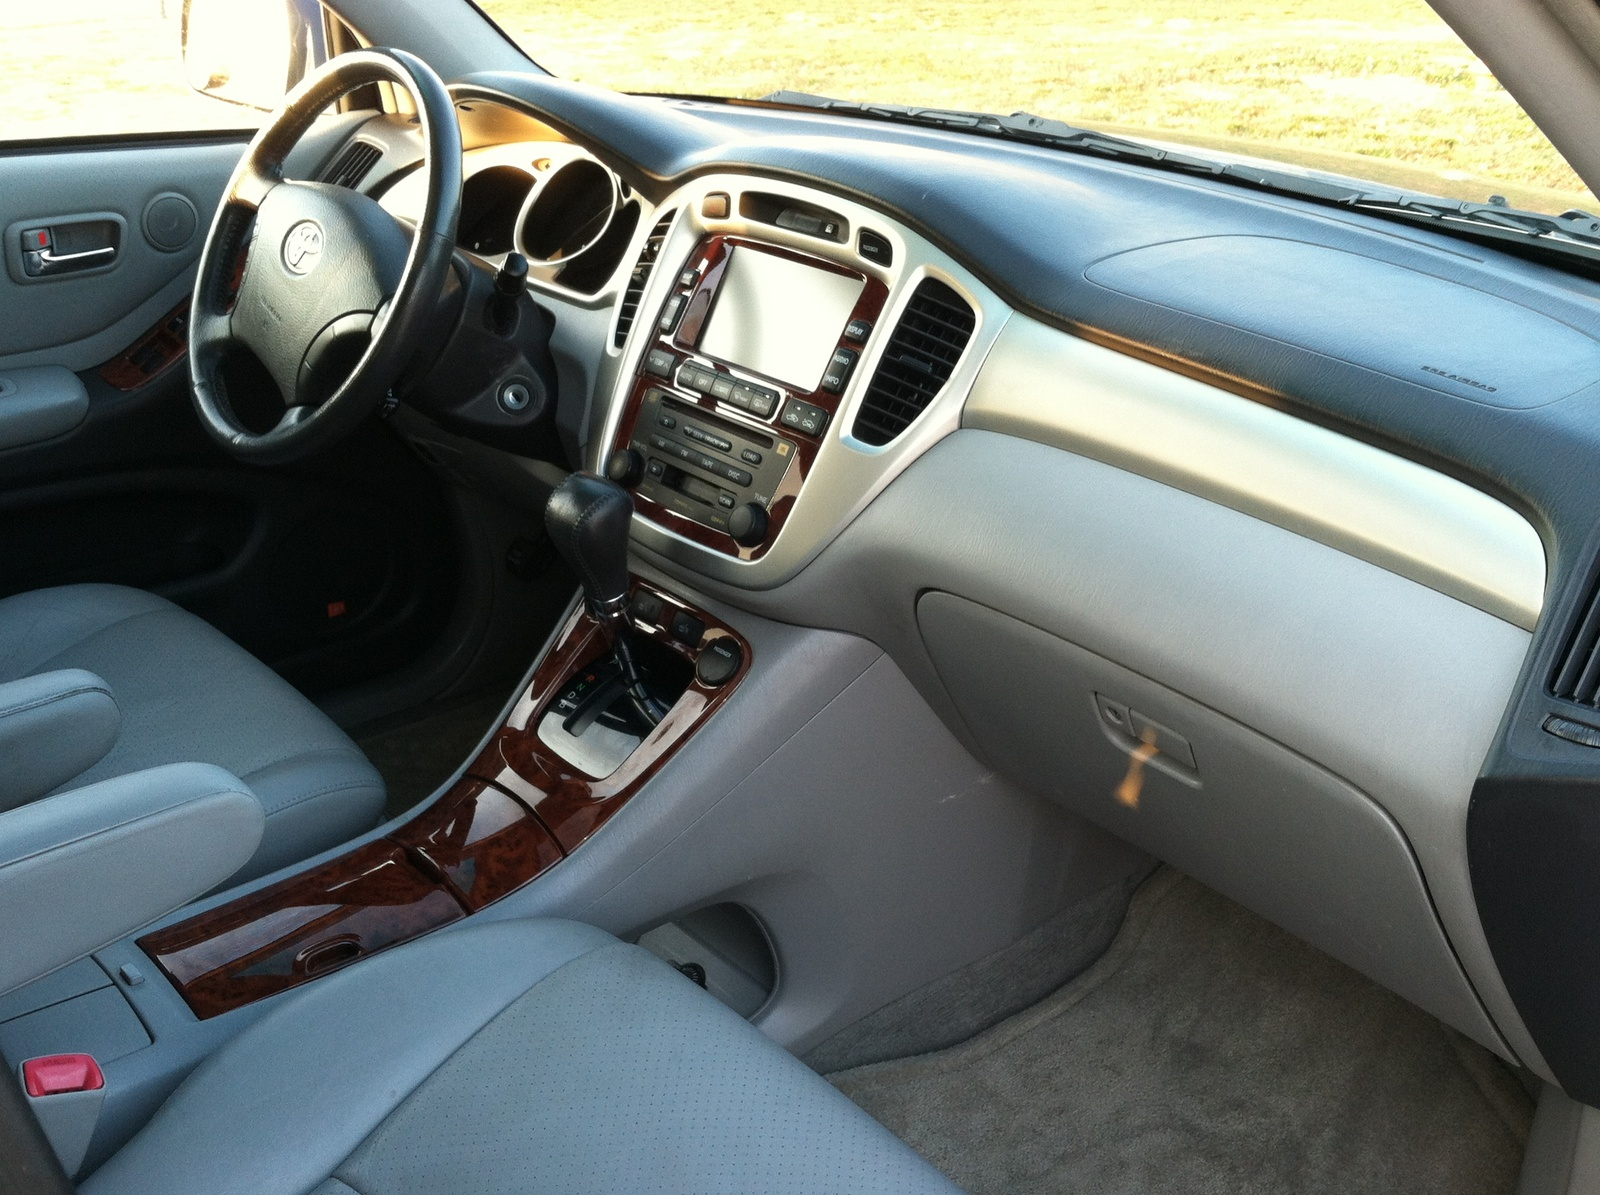 2006 Toyota Highlander Hybrid Pictures Cargurus